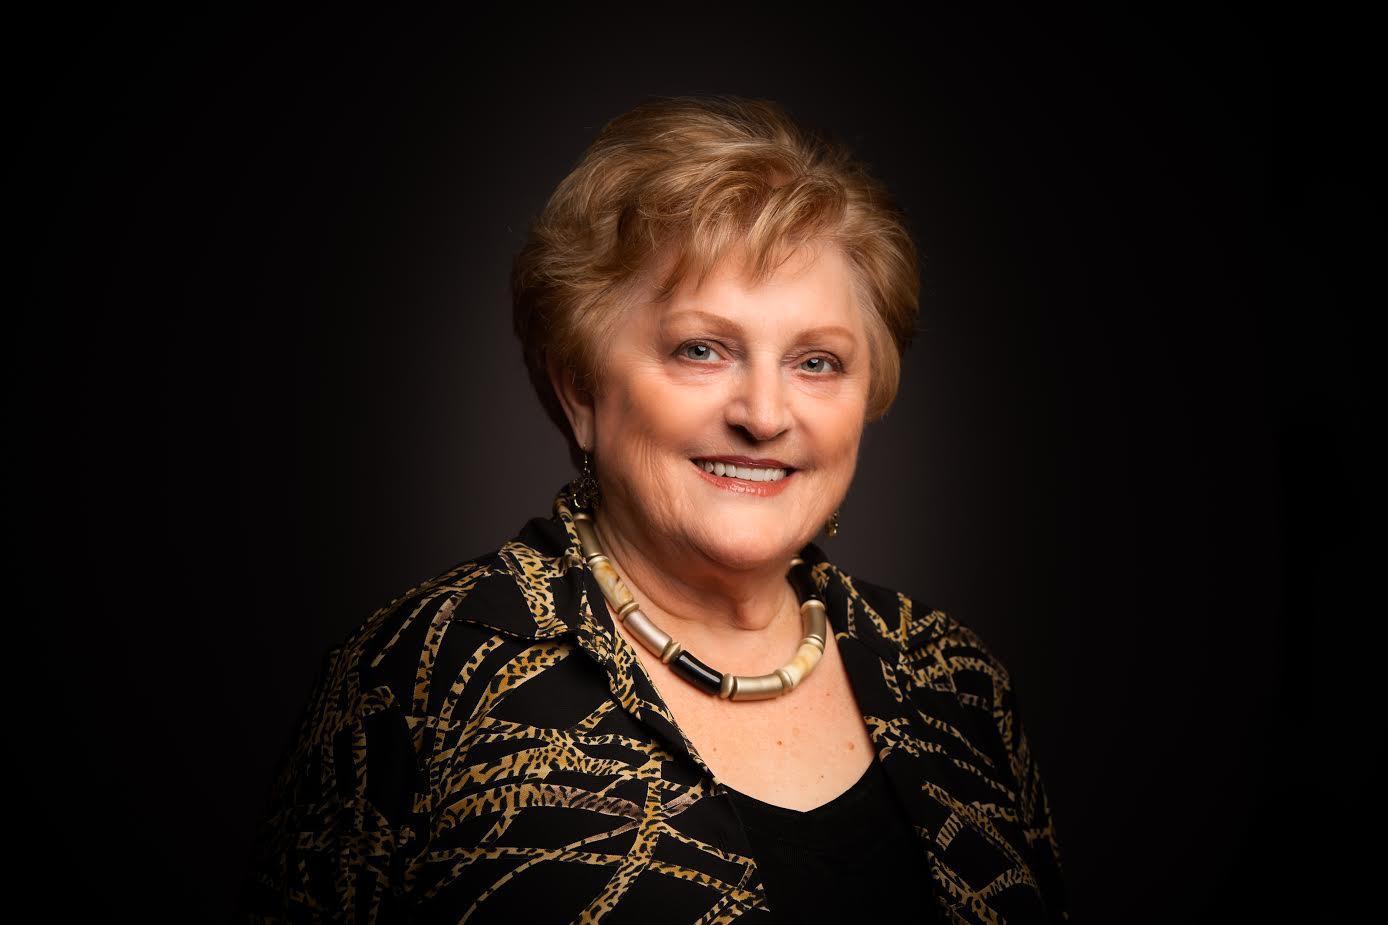 Jane St. Amant